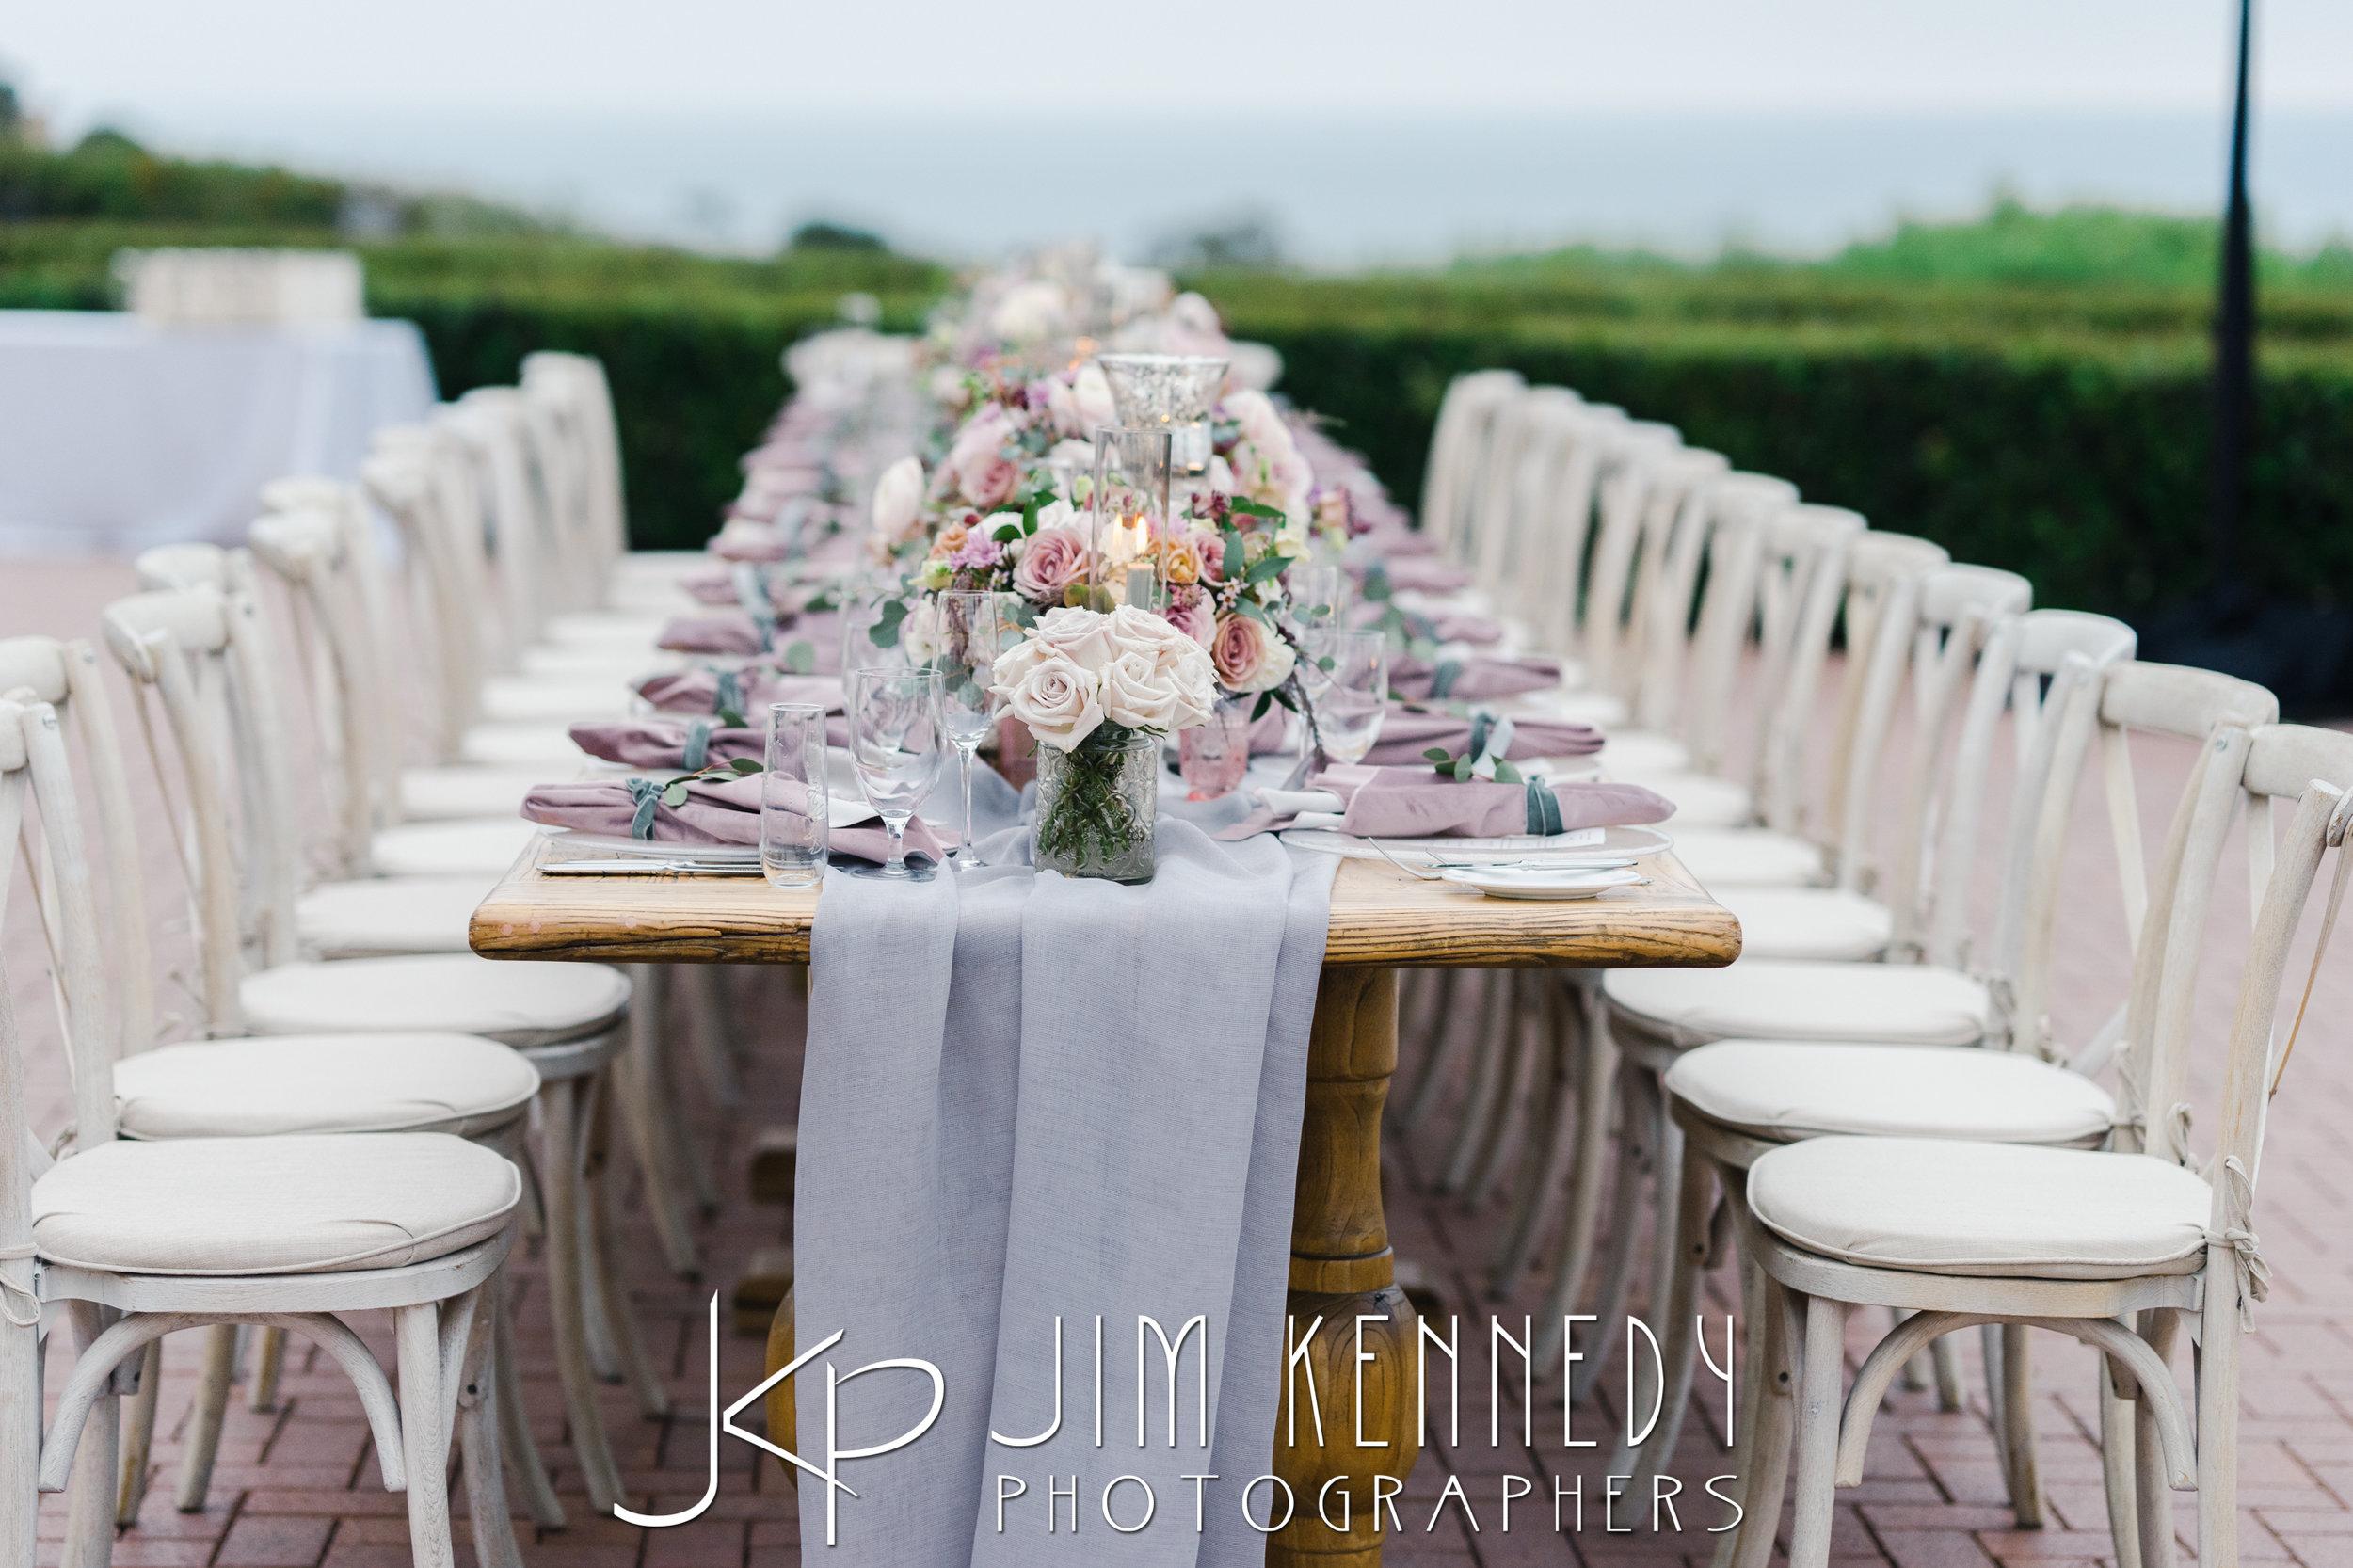 pelican-hill-wedding-jim-kenedy-photographers_0215.JPG